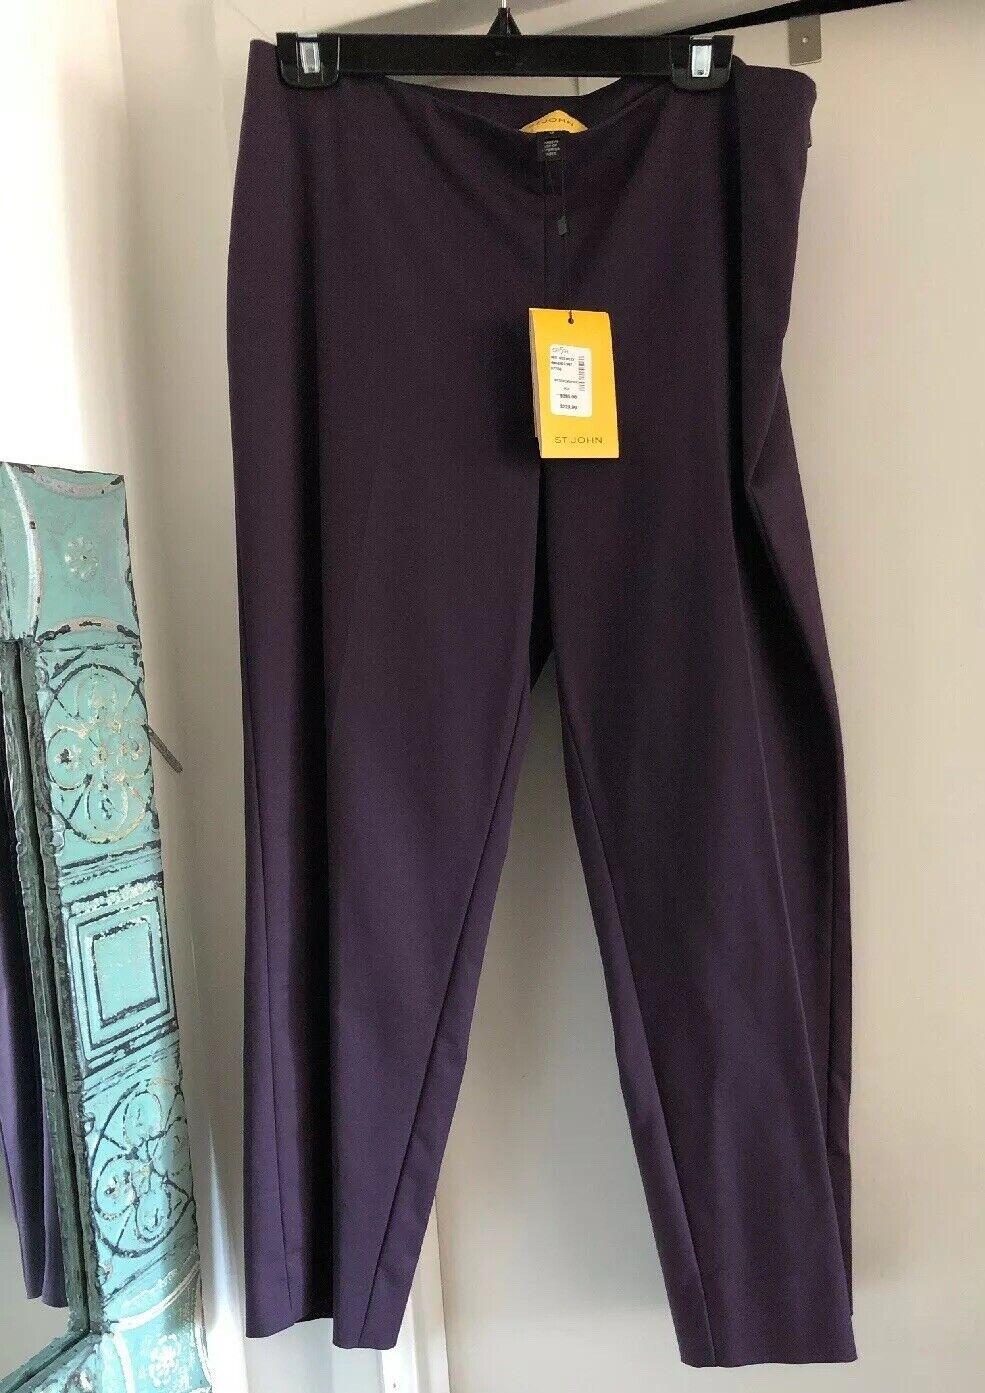 St. John NEW Aubergine lila Audrey Capri Ankle Pants R8230B3 USA 12 NWT  395